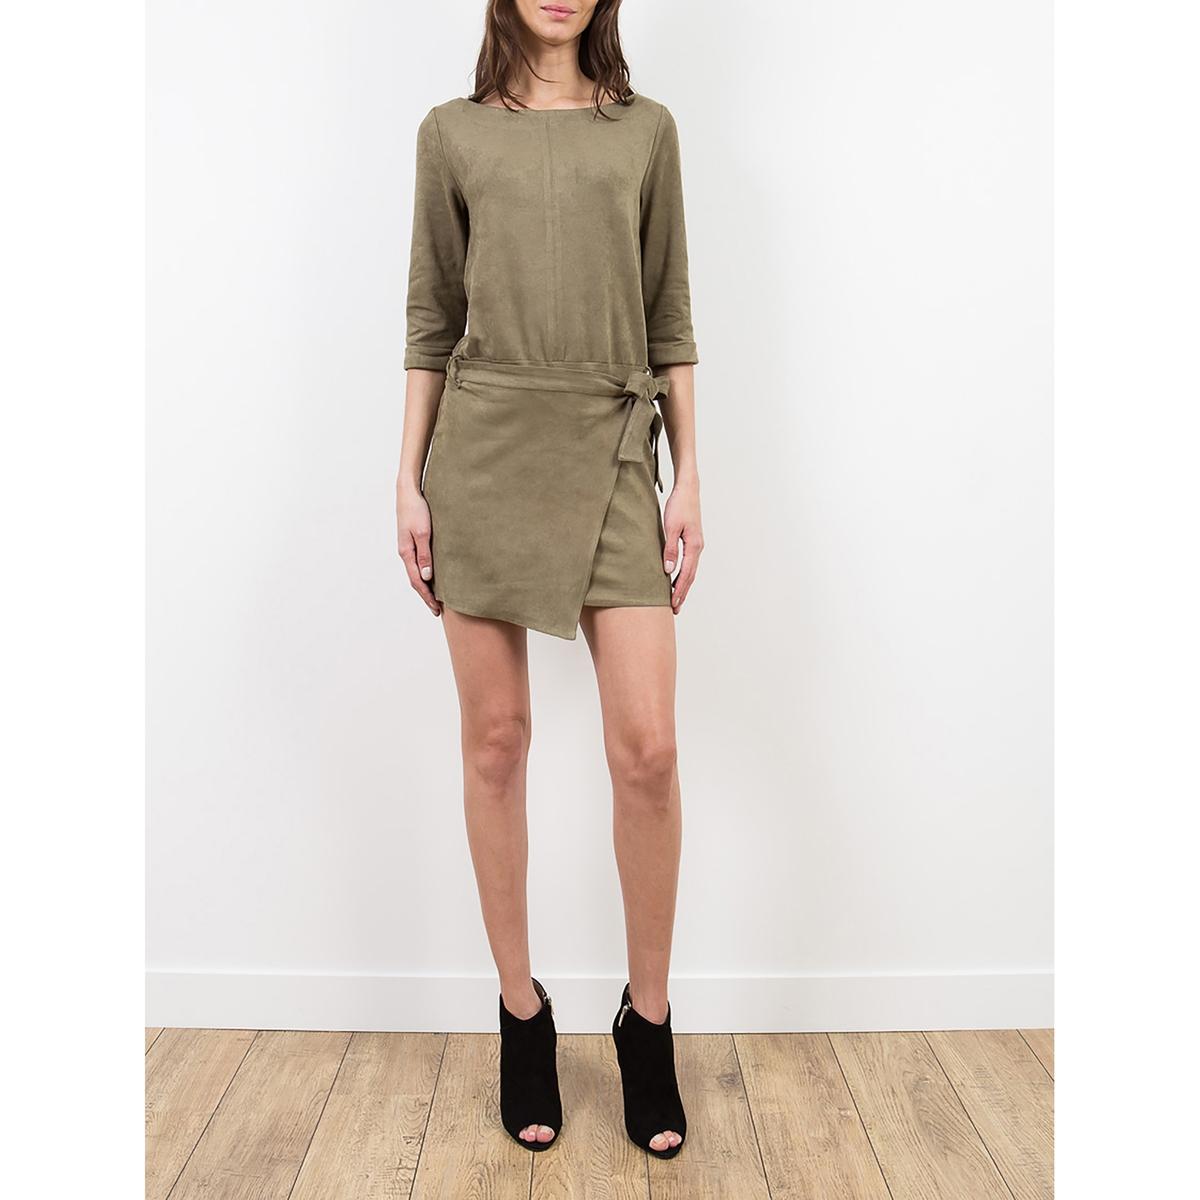 Платье с запахом ROOTS lenny b блузка